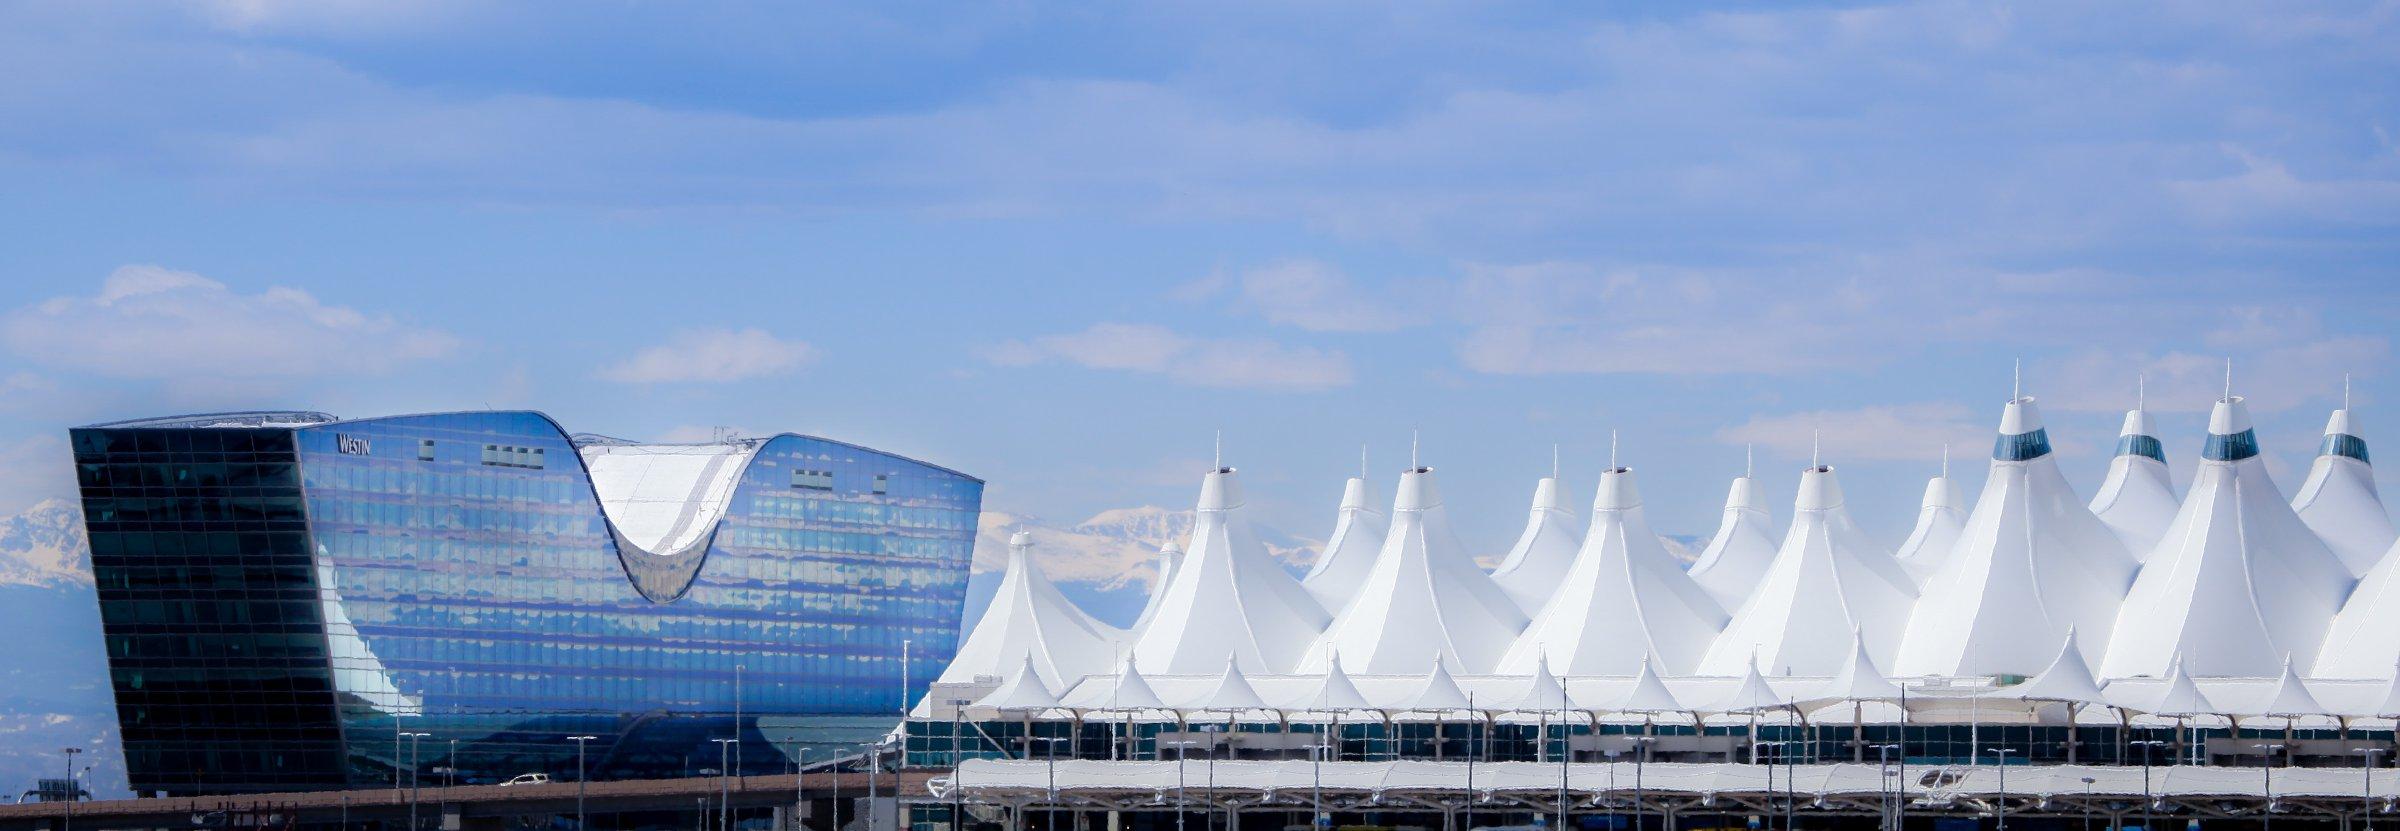 Westin Denver International Airport Denver International